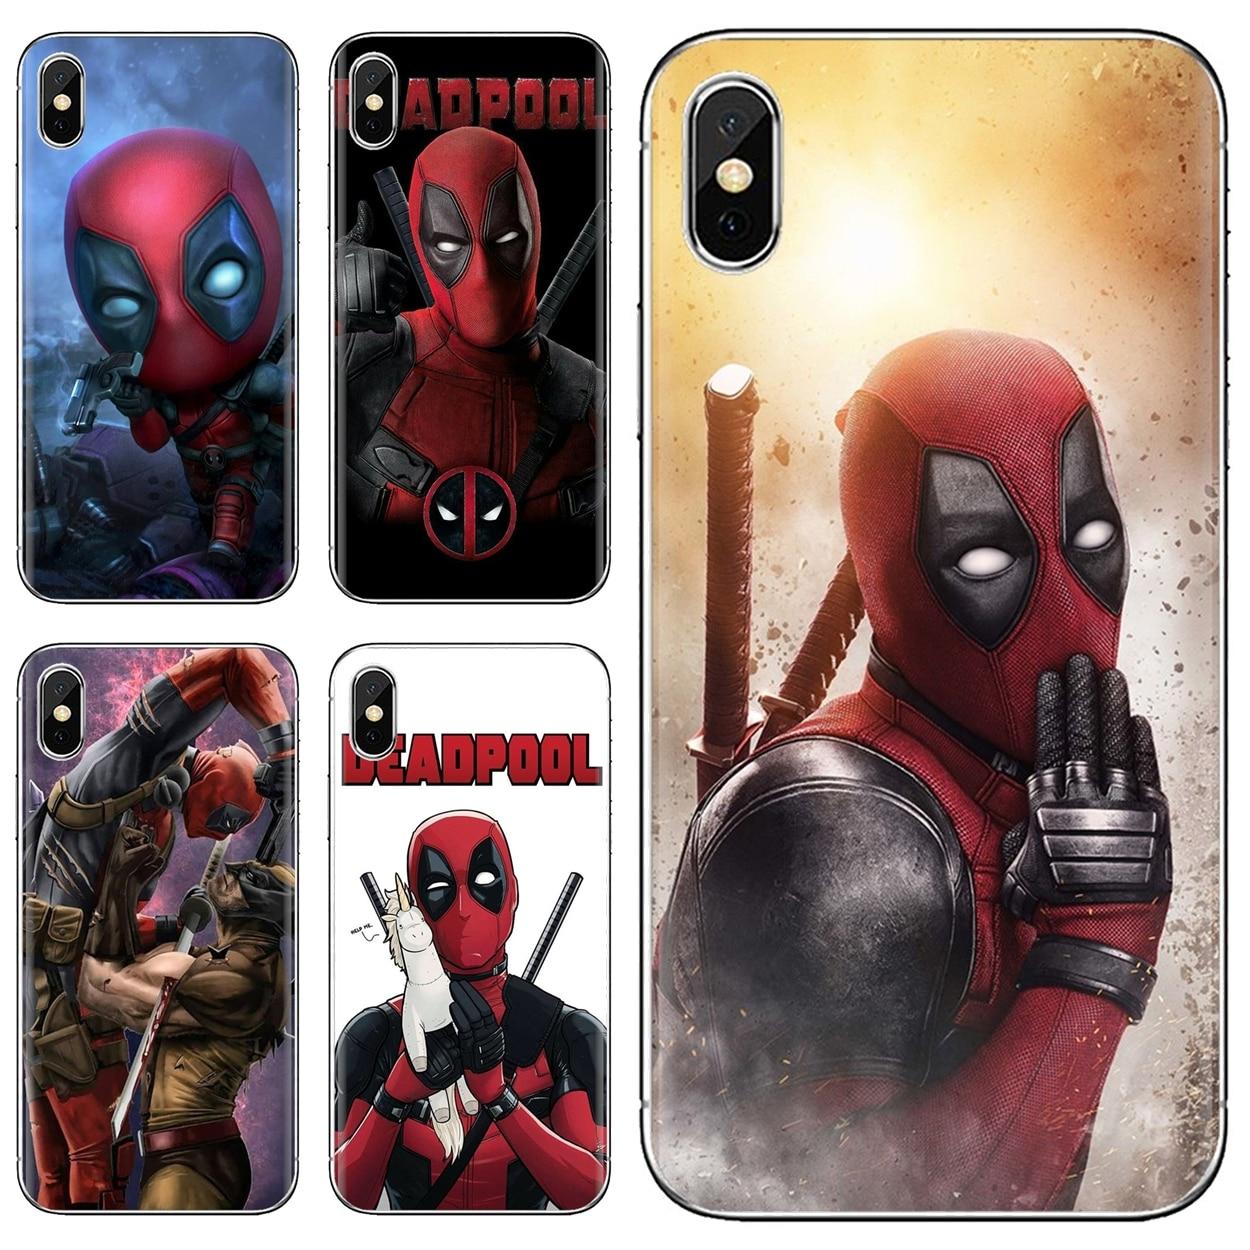 Cool Silicone Phone Case Deadpool Dead Pool Funny For Samsung Galaxy J1 J2 J3 J4 J5 J6 J7 J8 Plus 2018 Prime 2015 2016 2017 EU